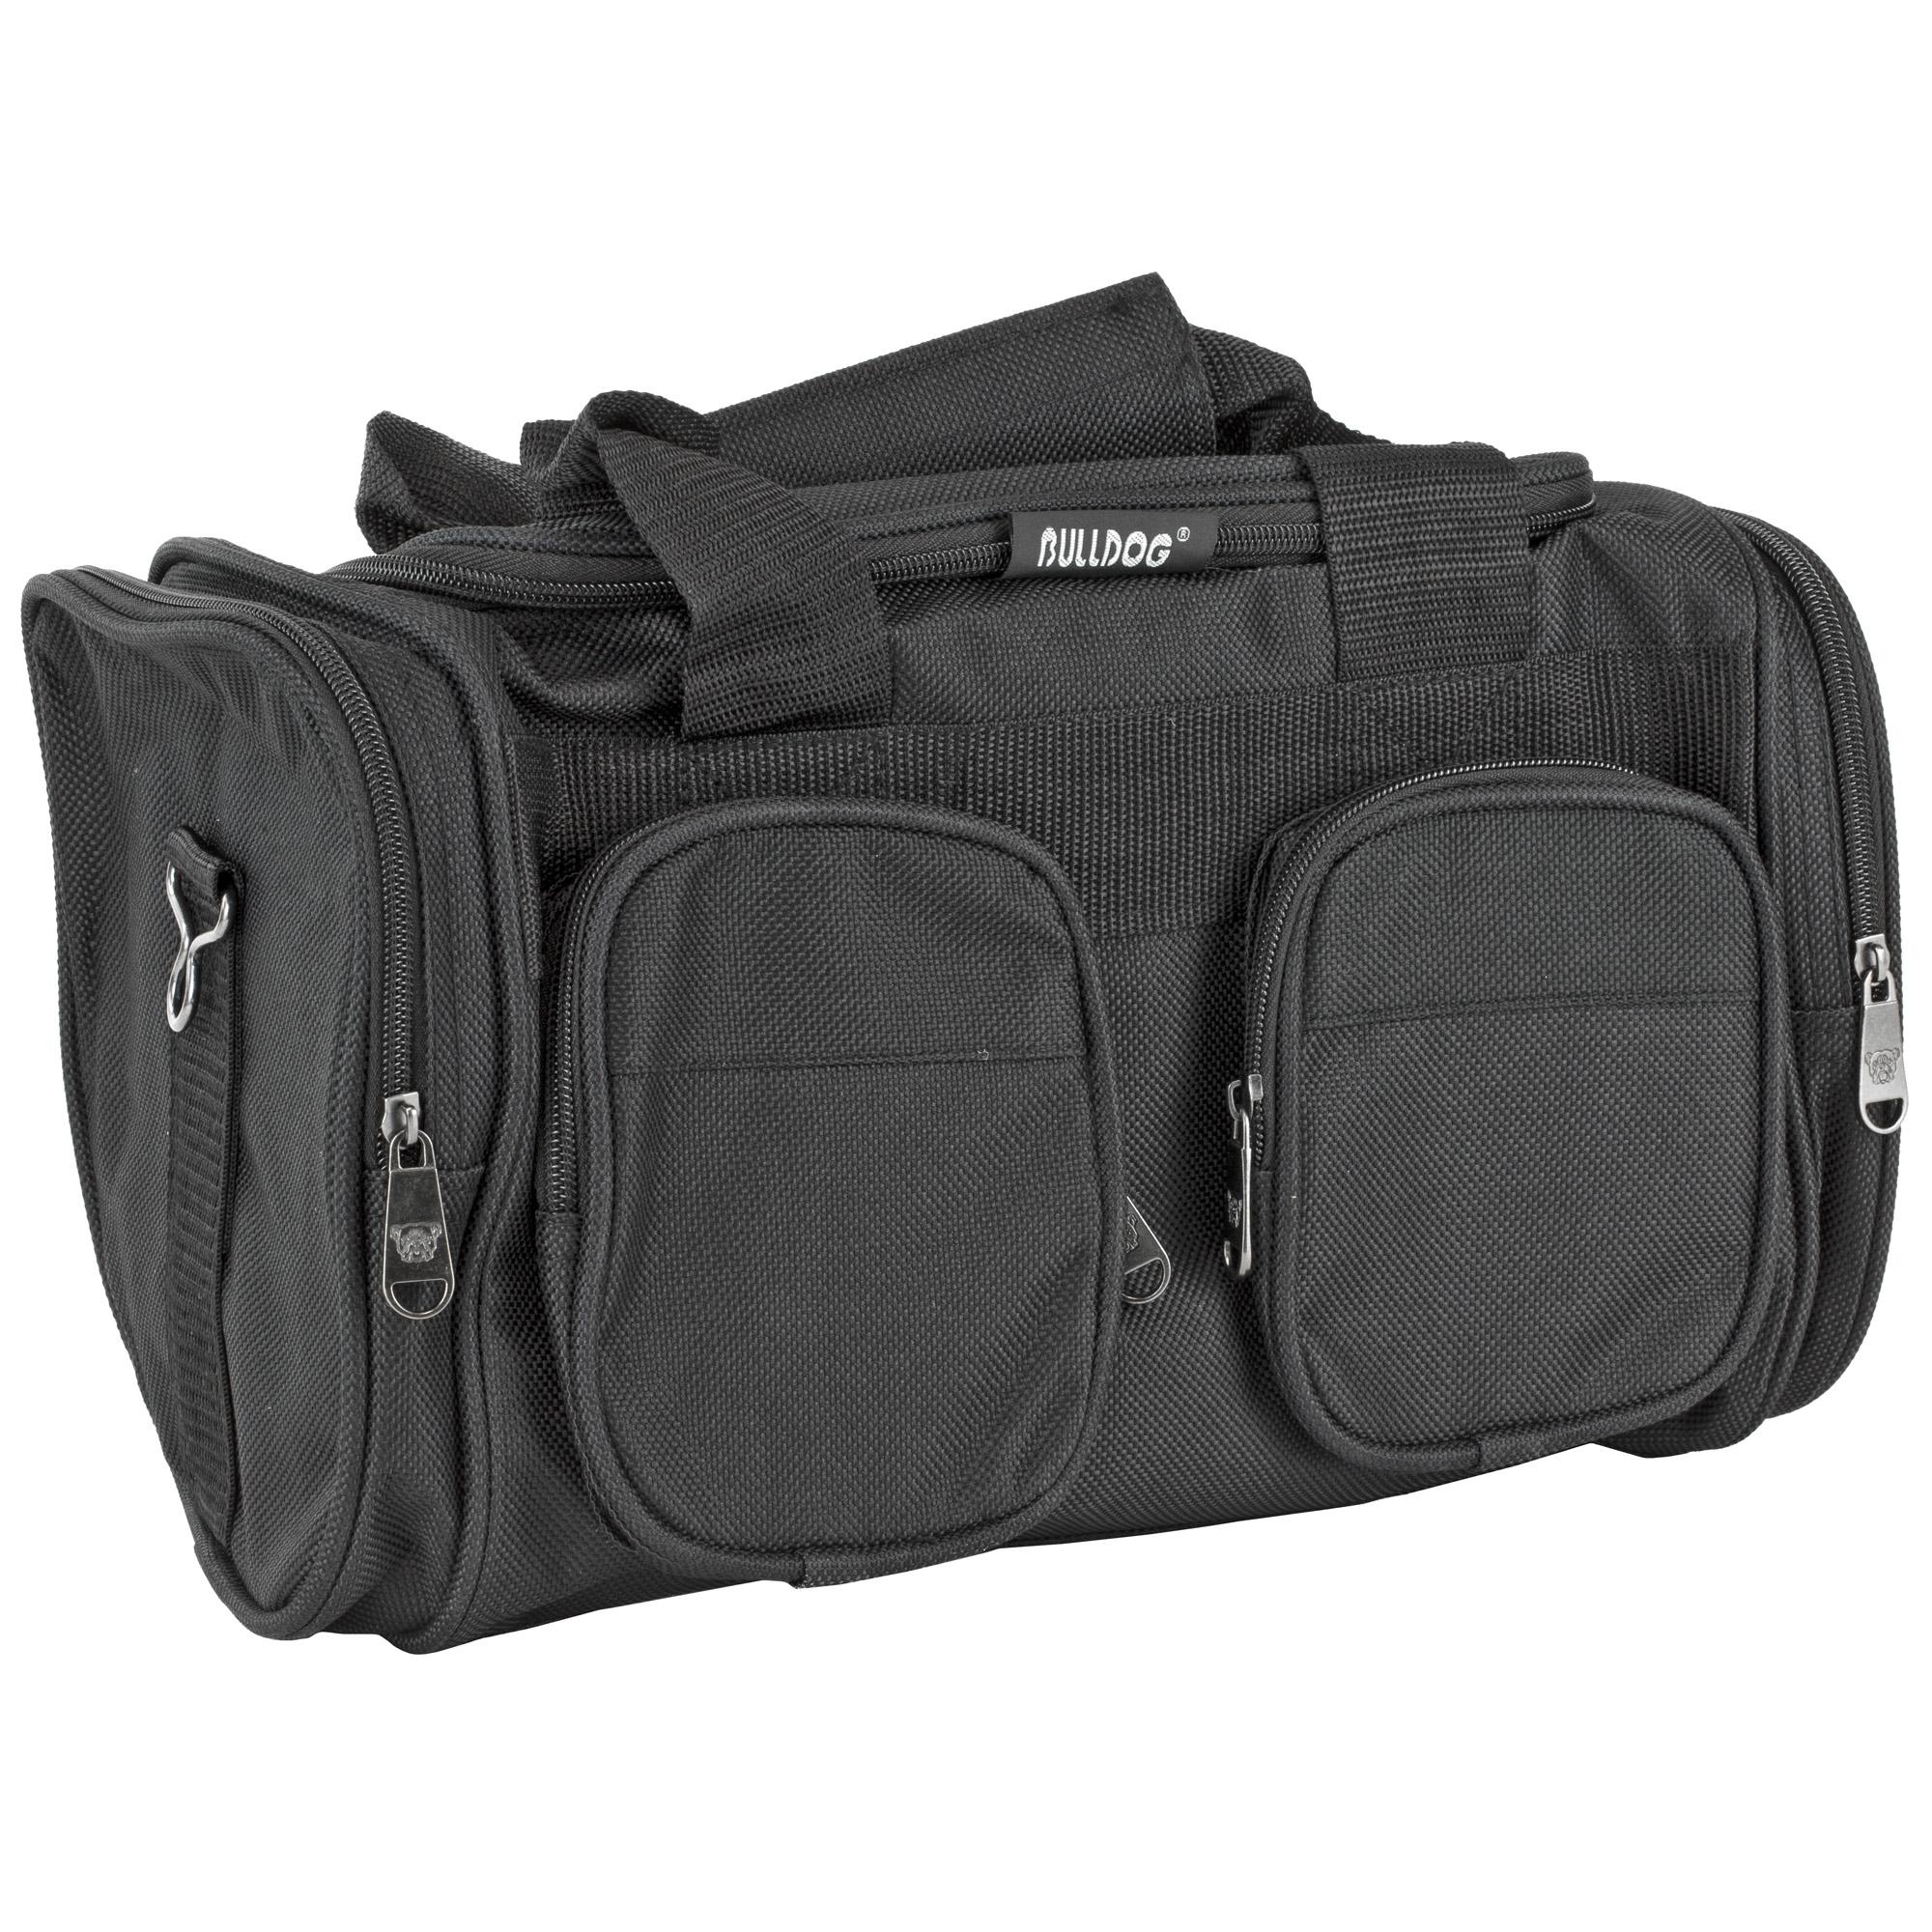 Bulldog Range Bag Econ W/strap Blk